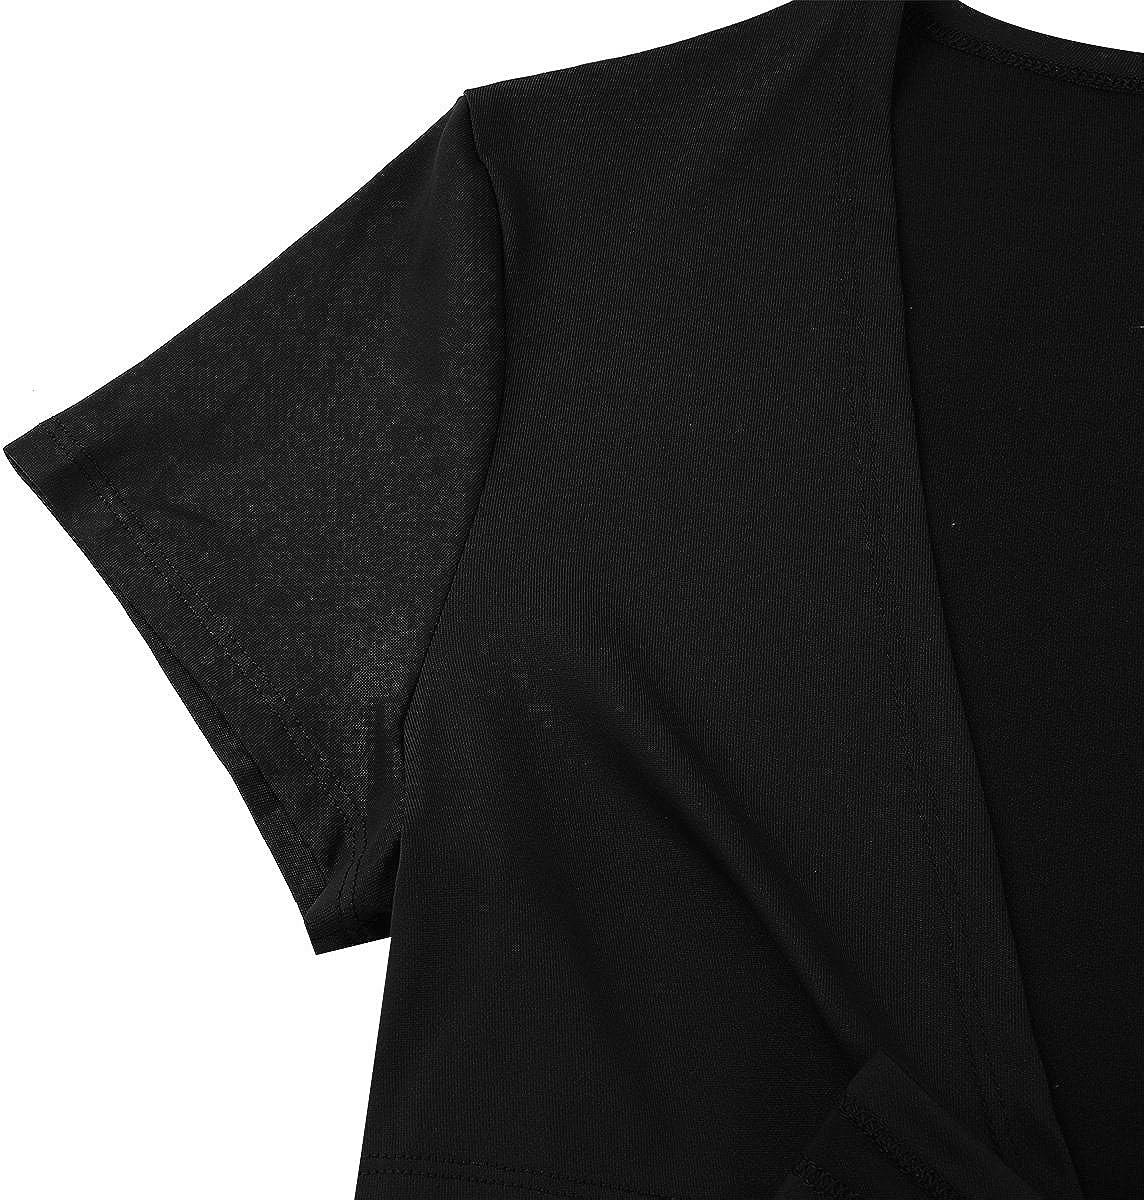 Aislor Womens Fashion Deep V Neck Short Sleeve Front Tie Up Bolero Cardigan Crop Top Shrug Shirt